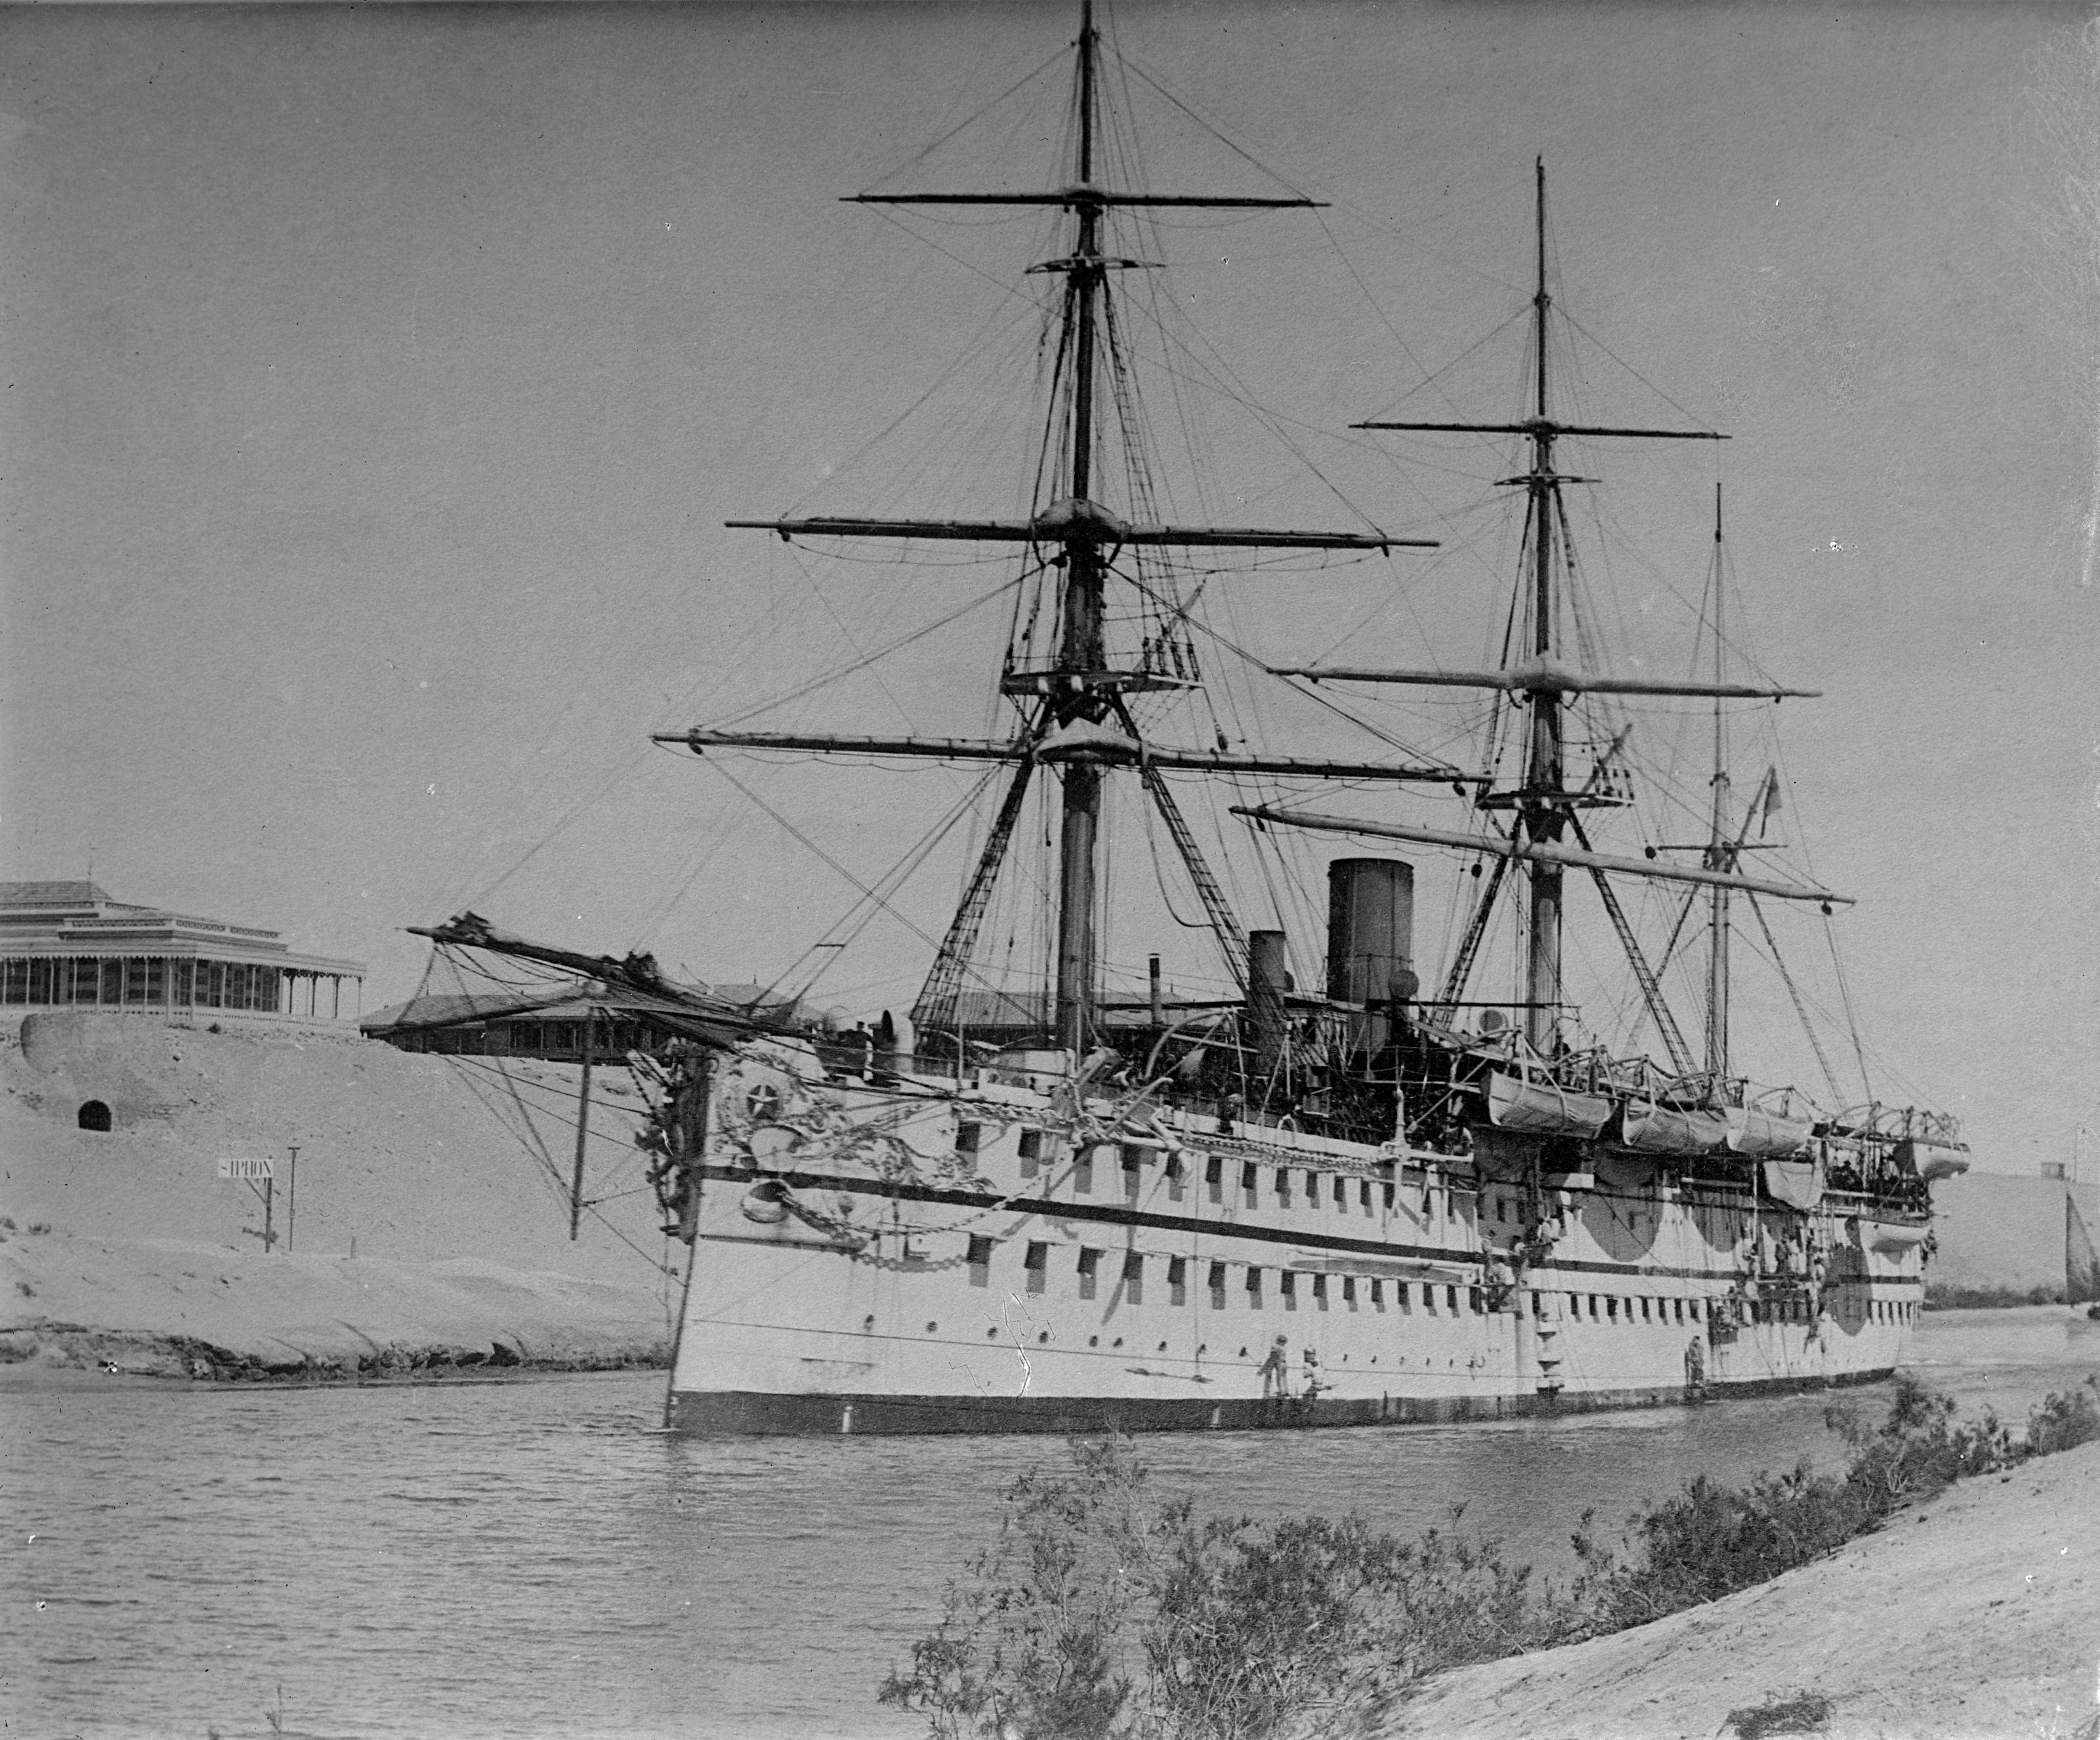 HMS_Malabar_(2)_-_SLV_H91.108-1543 (1) - HMS Terror